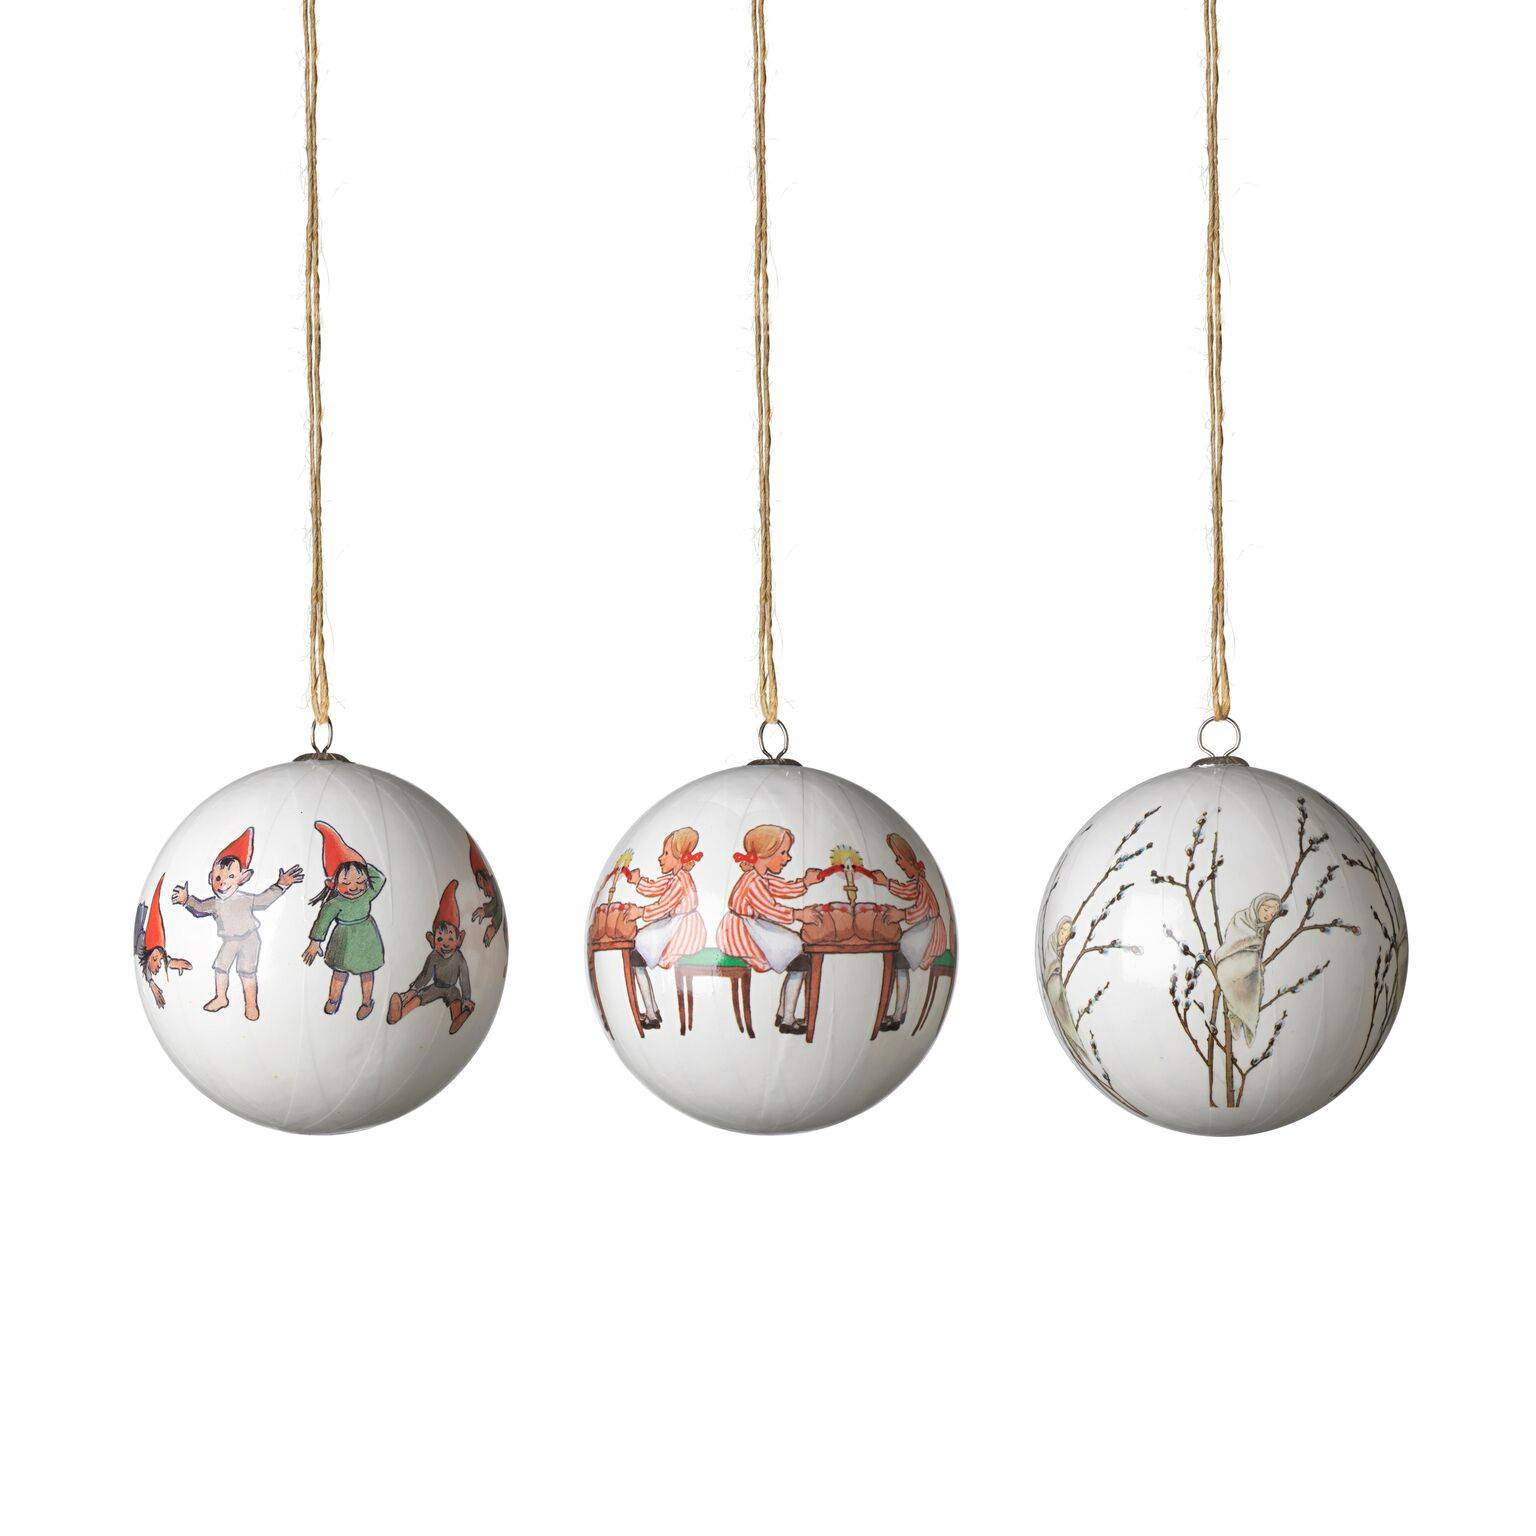 Design House Elsa Beskow Christmas Tree Ornaments, Little Willow & Co